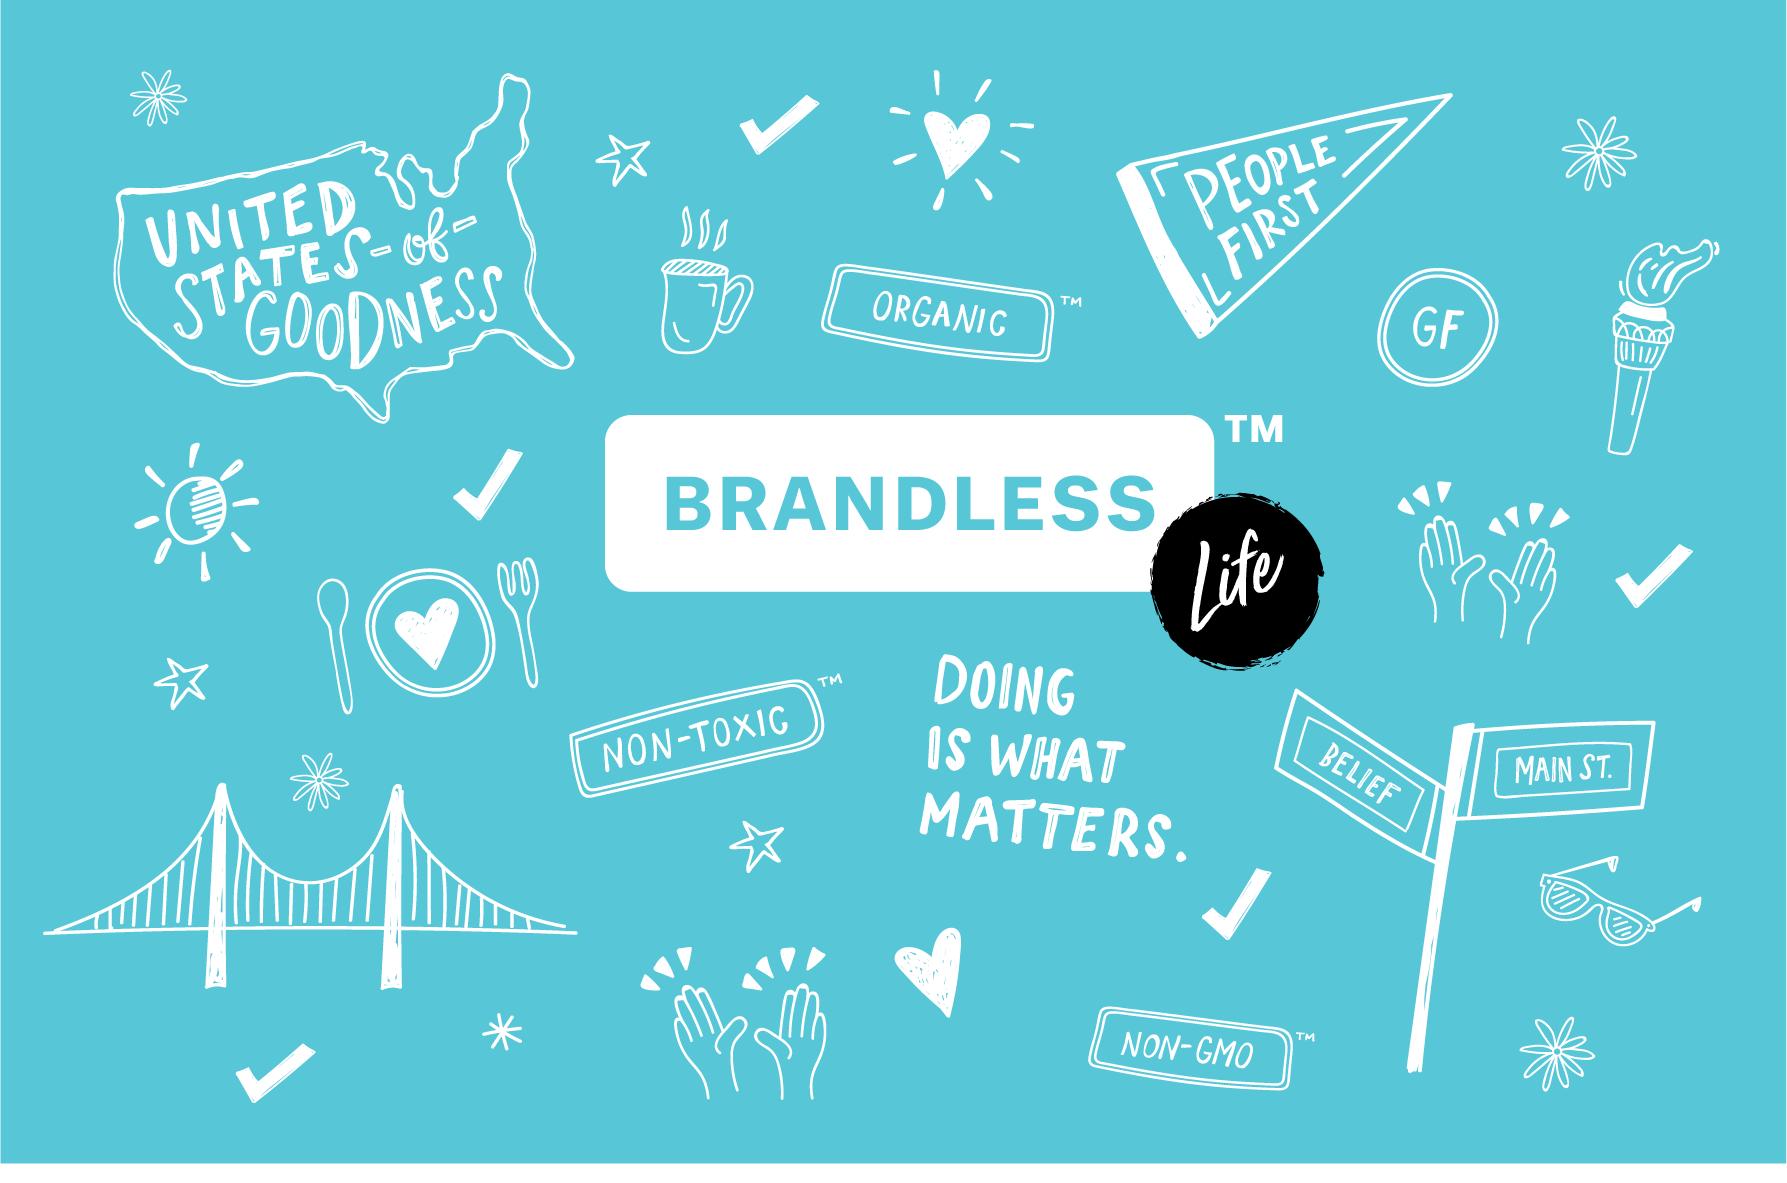 brandlesslife_logo_illustrations-01.png